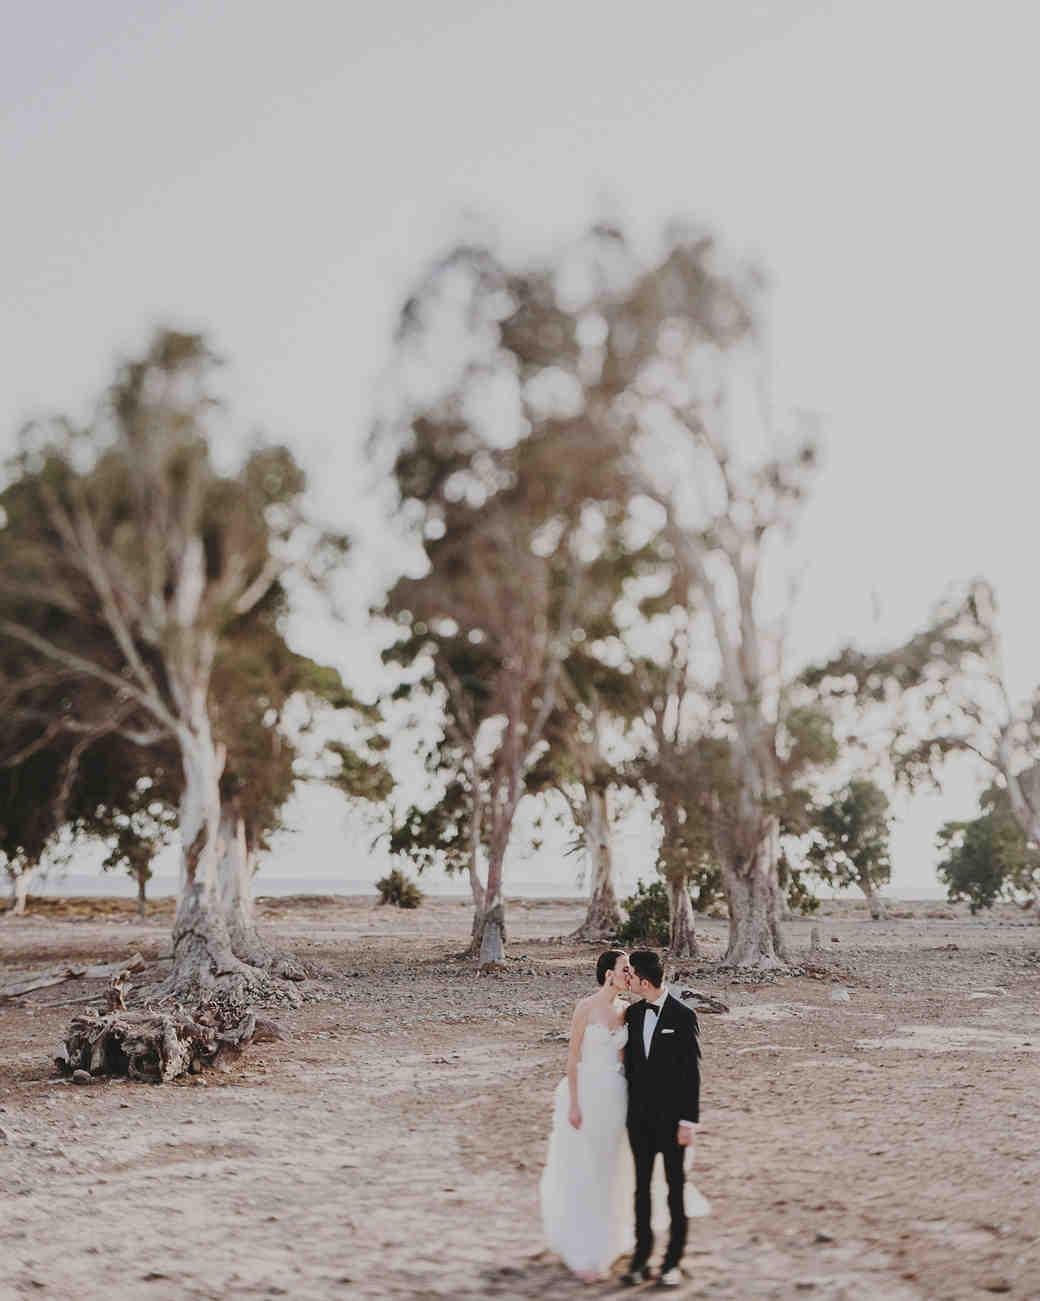 tamara-brett-wedding-couple-0910-s112120-0915.jpg